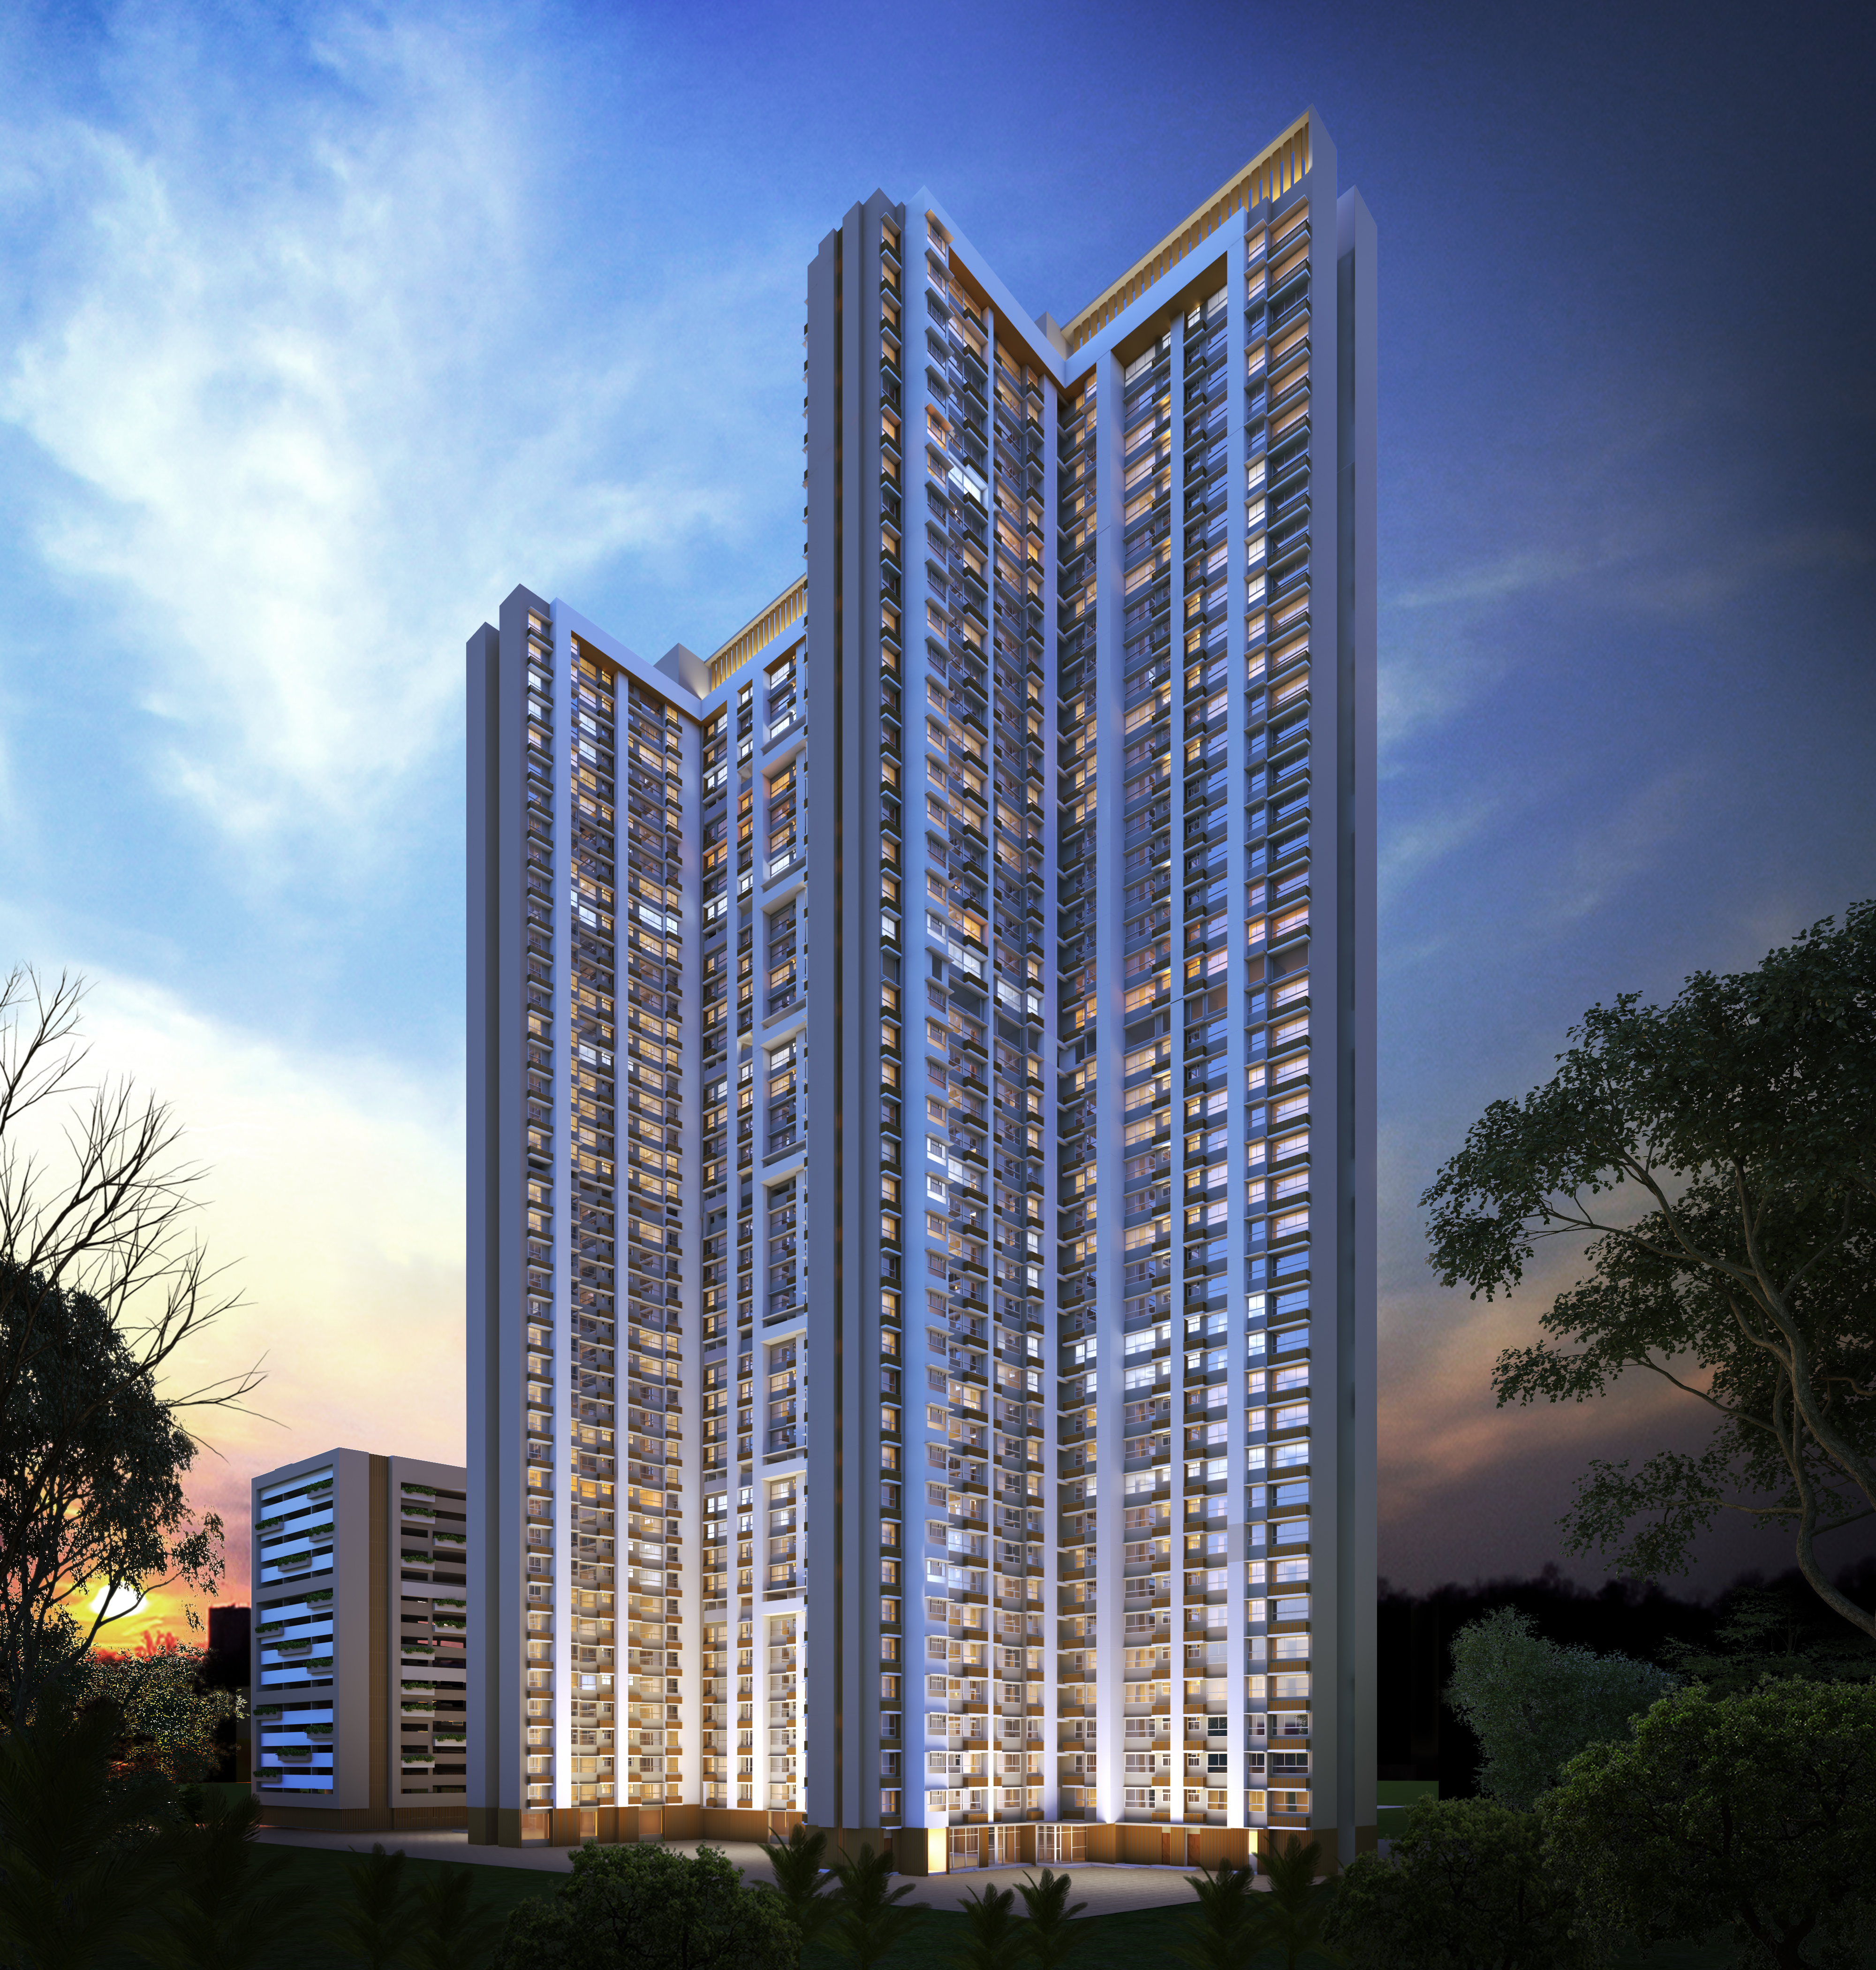 piramal vaikunth a class homes series 2 tower view16